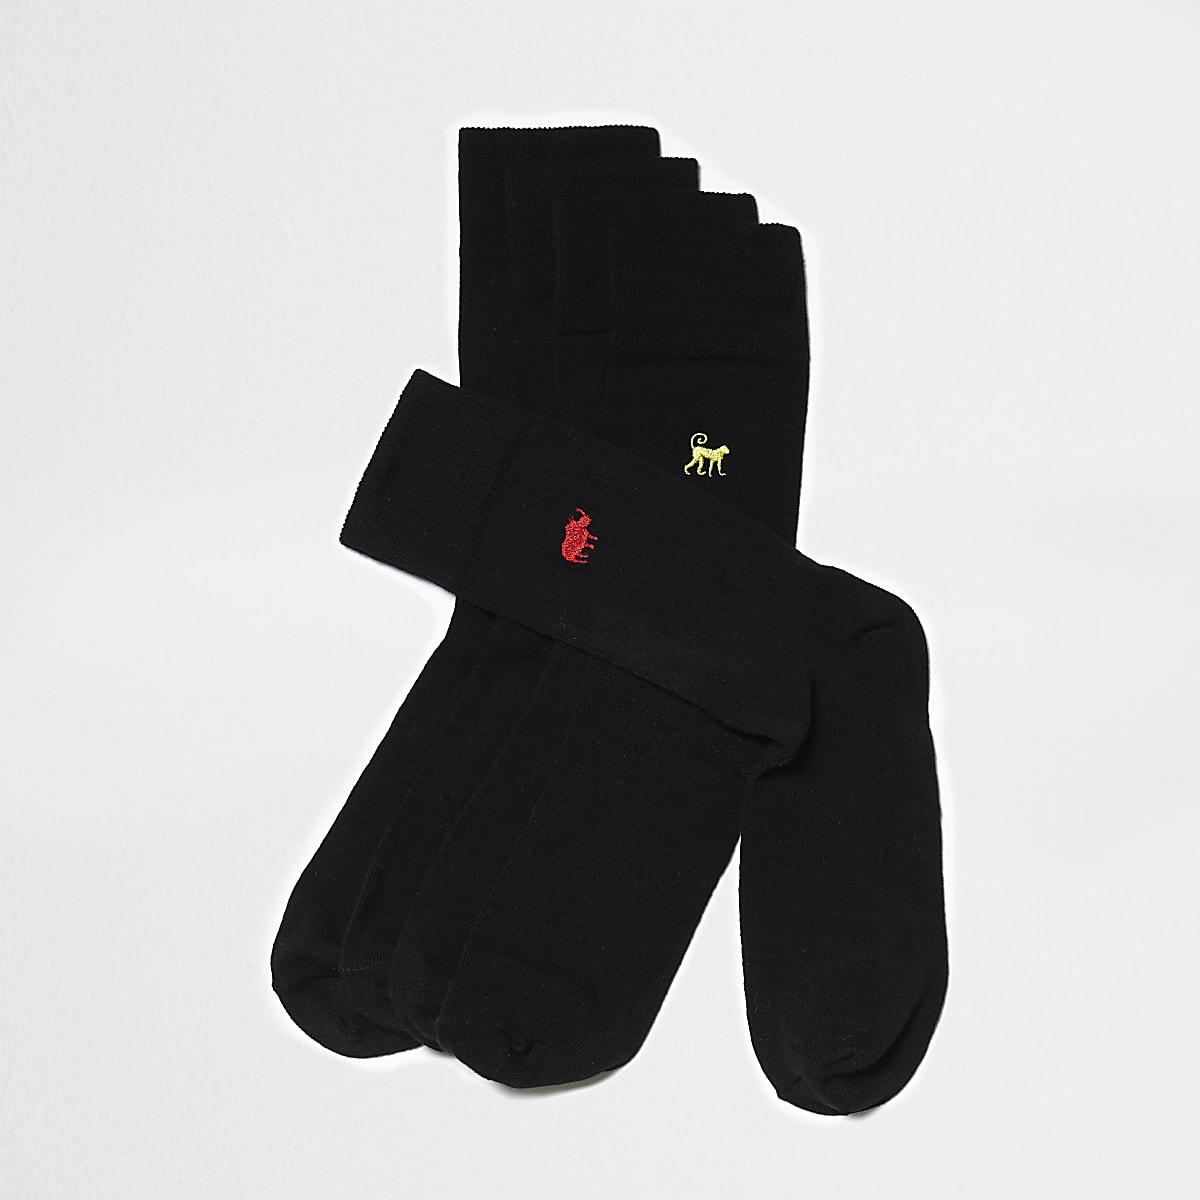 Black animal embroidered socks 5 pack